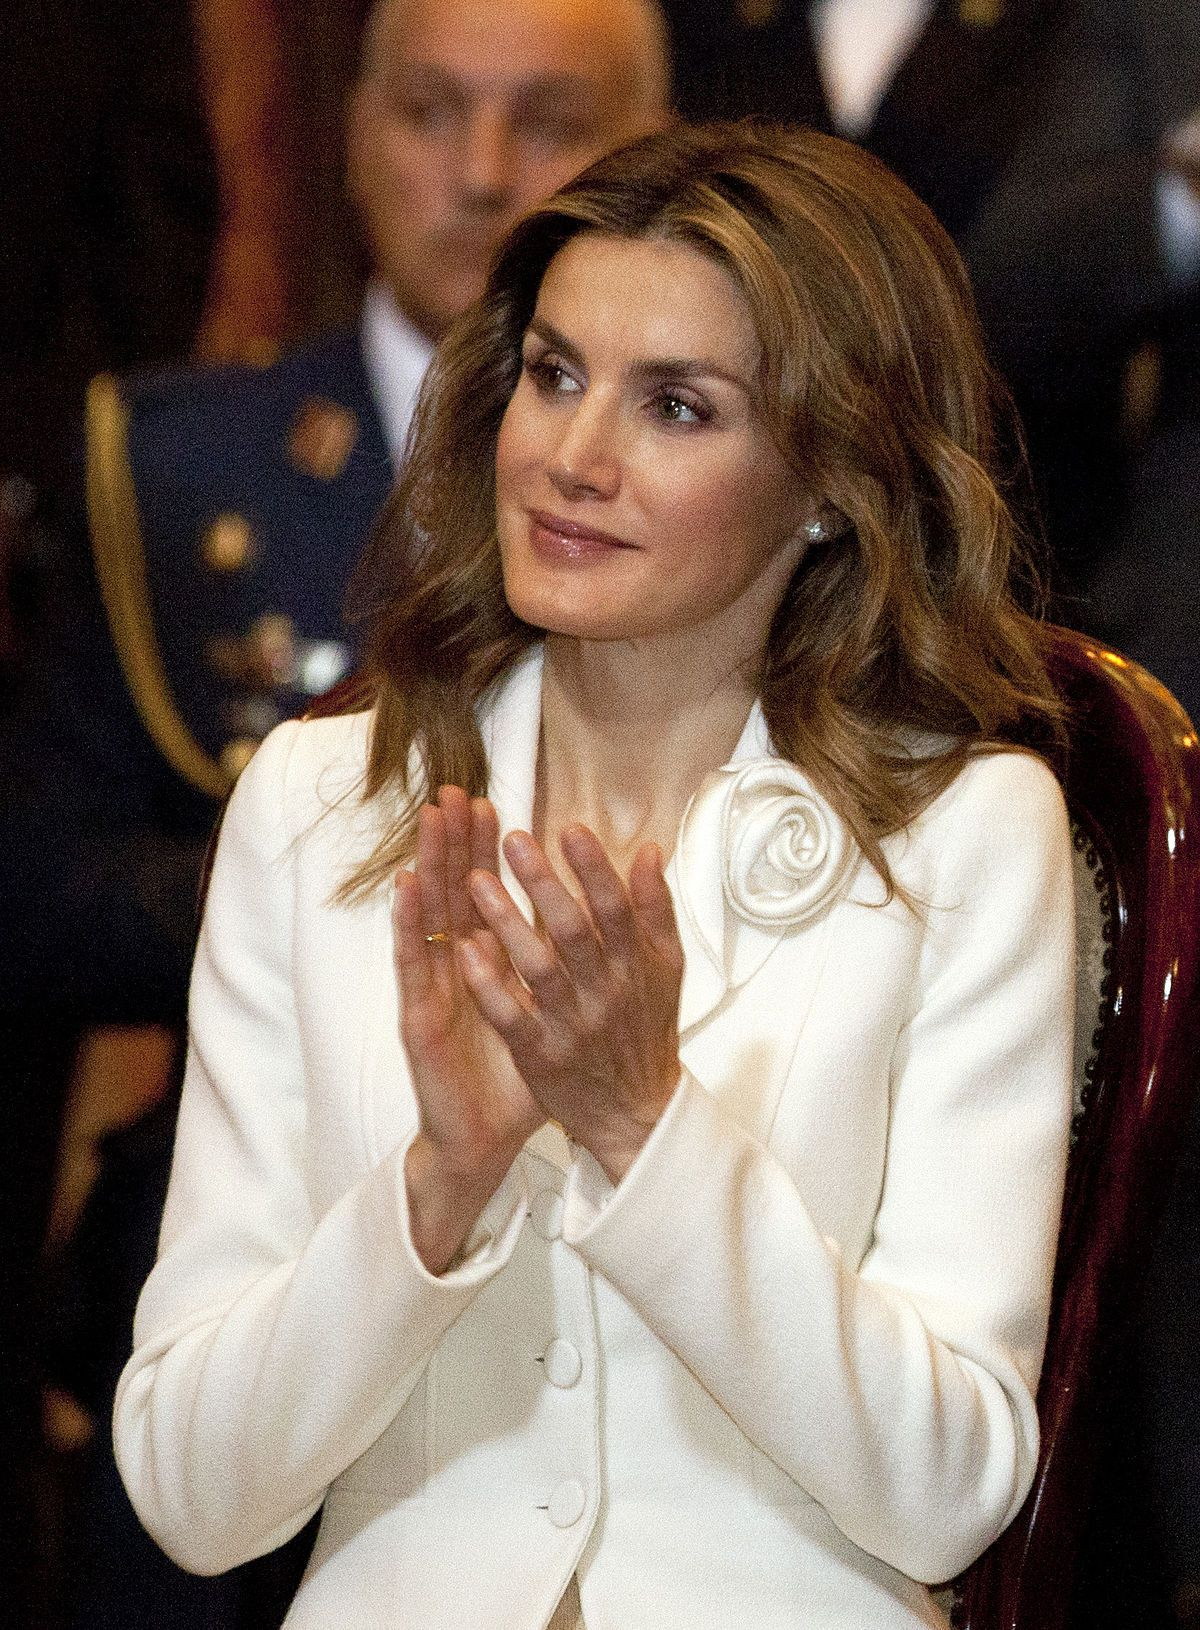 4/2/2017 SPAIN: Queen Letizia of Spain - Wikipedia